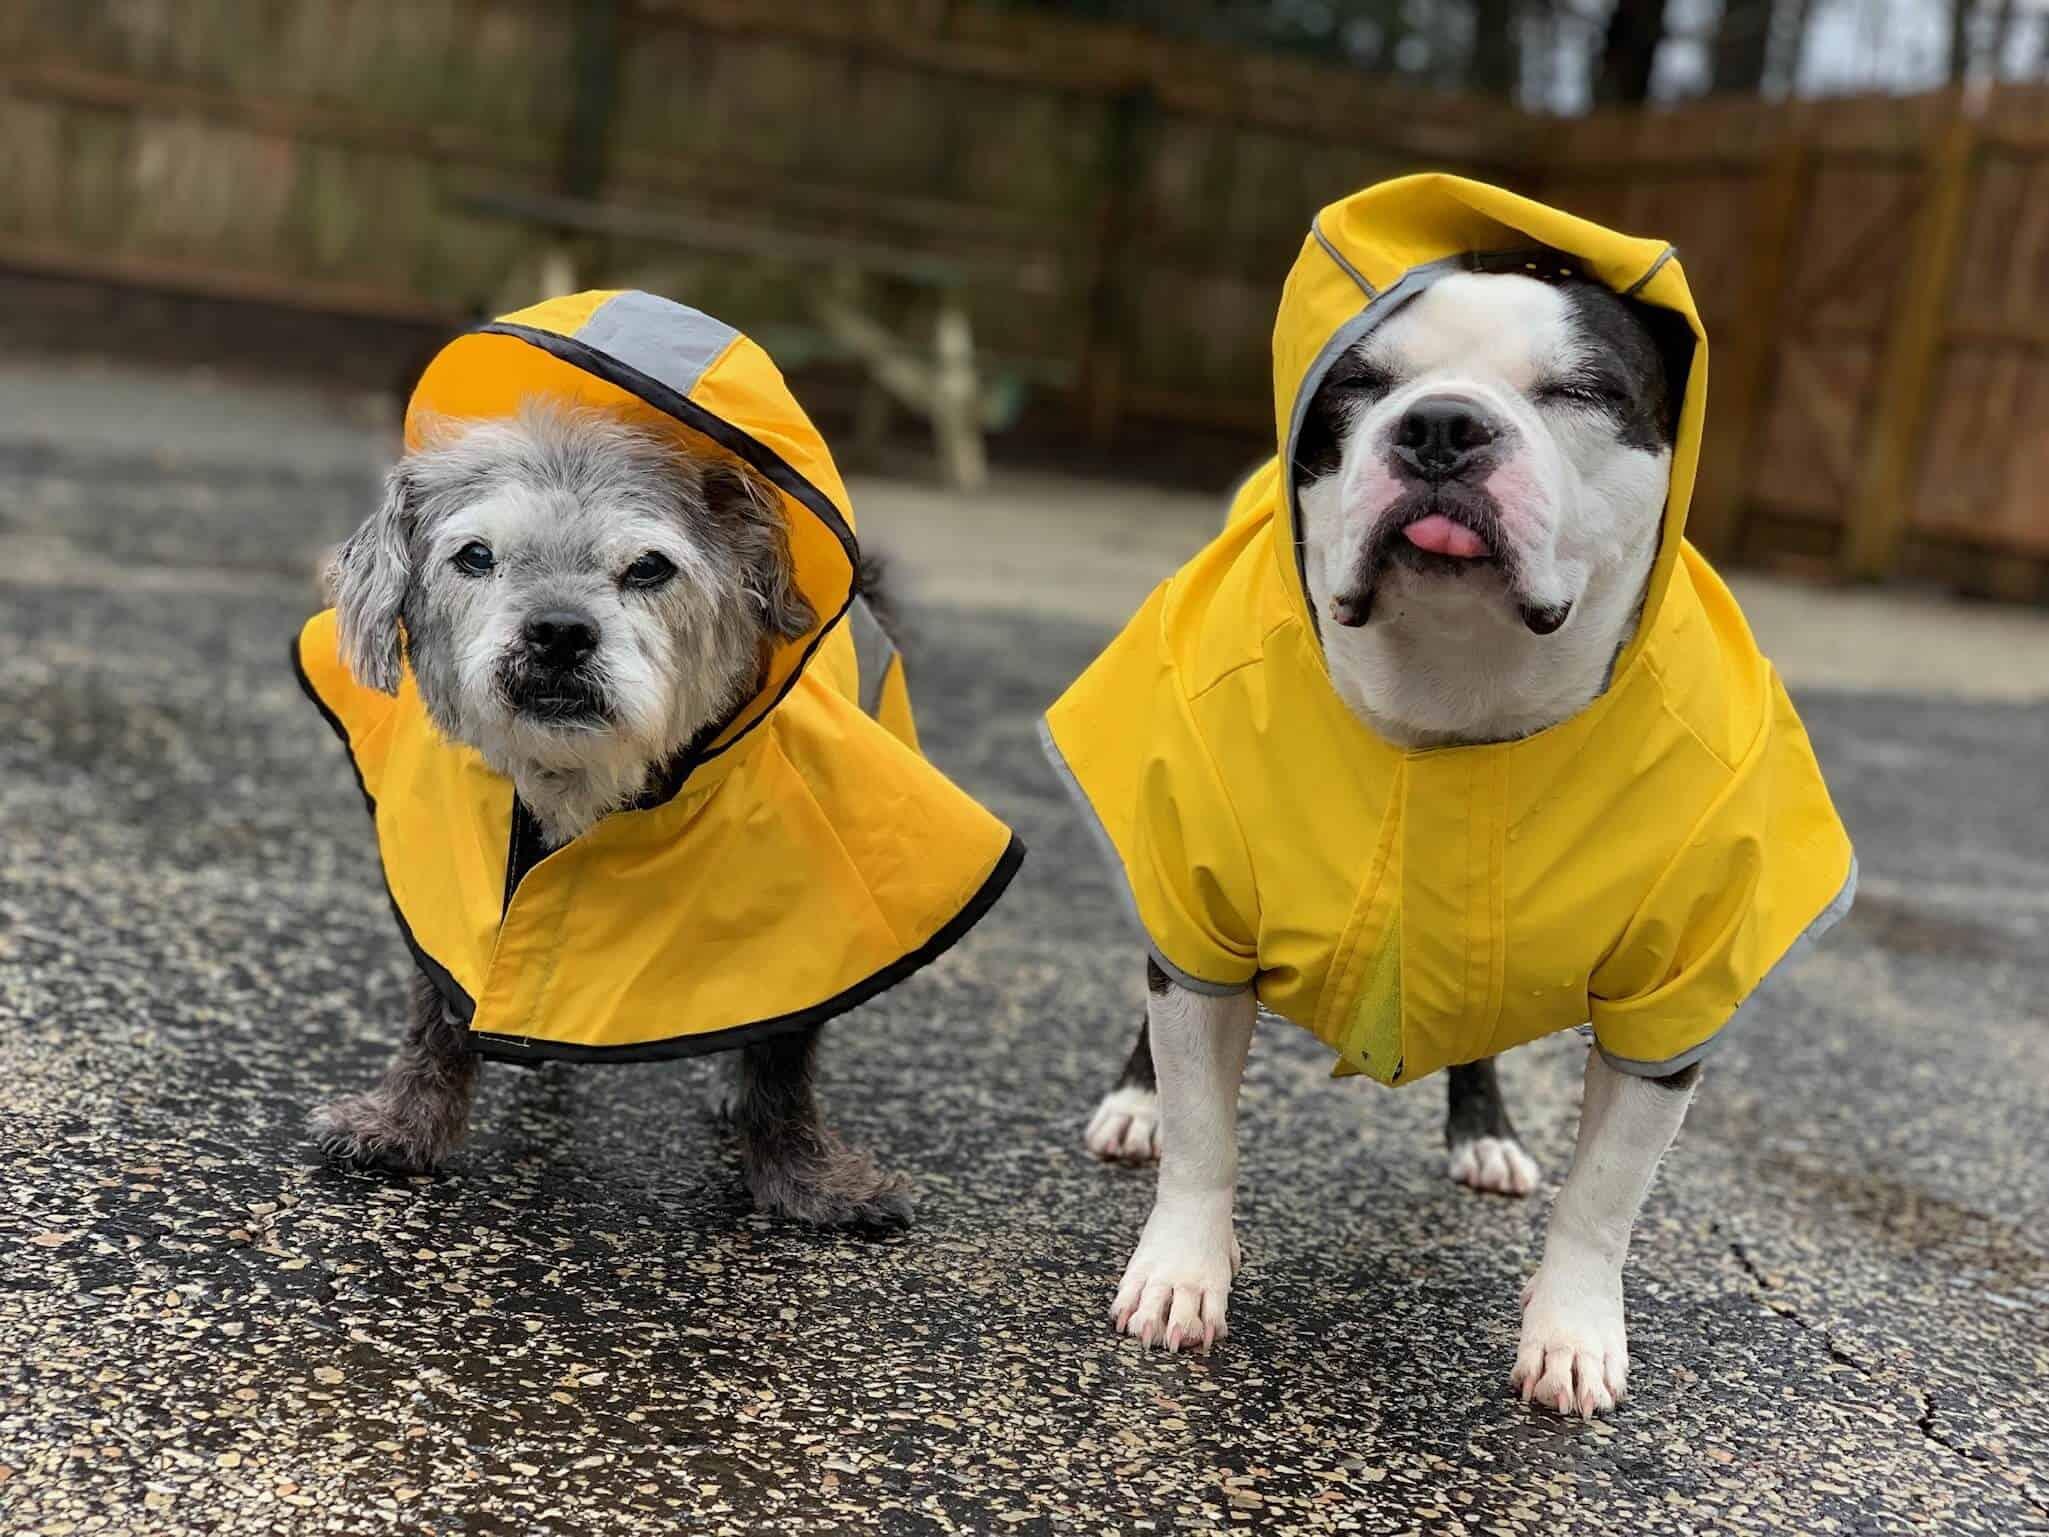 Rainy day at Doggy Daycare